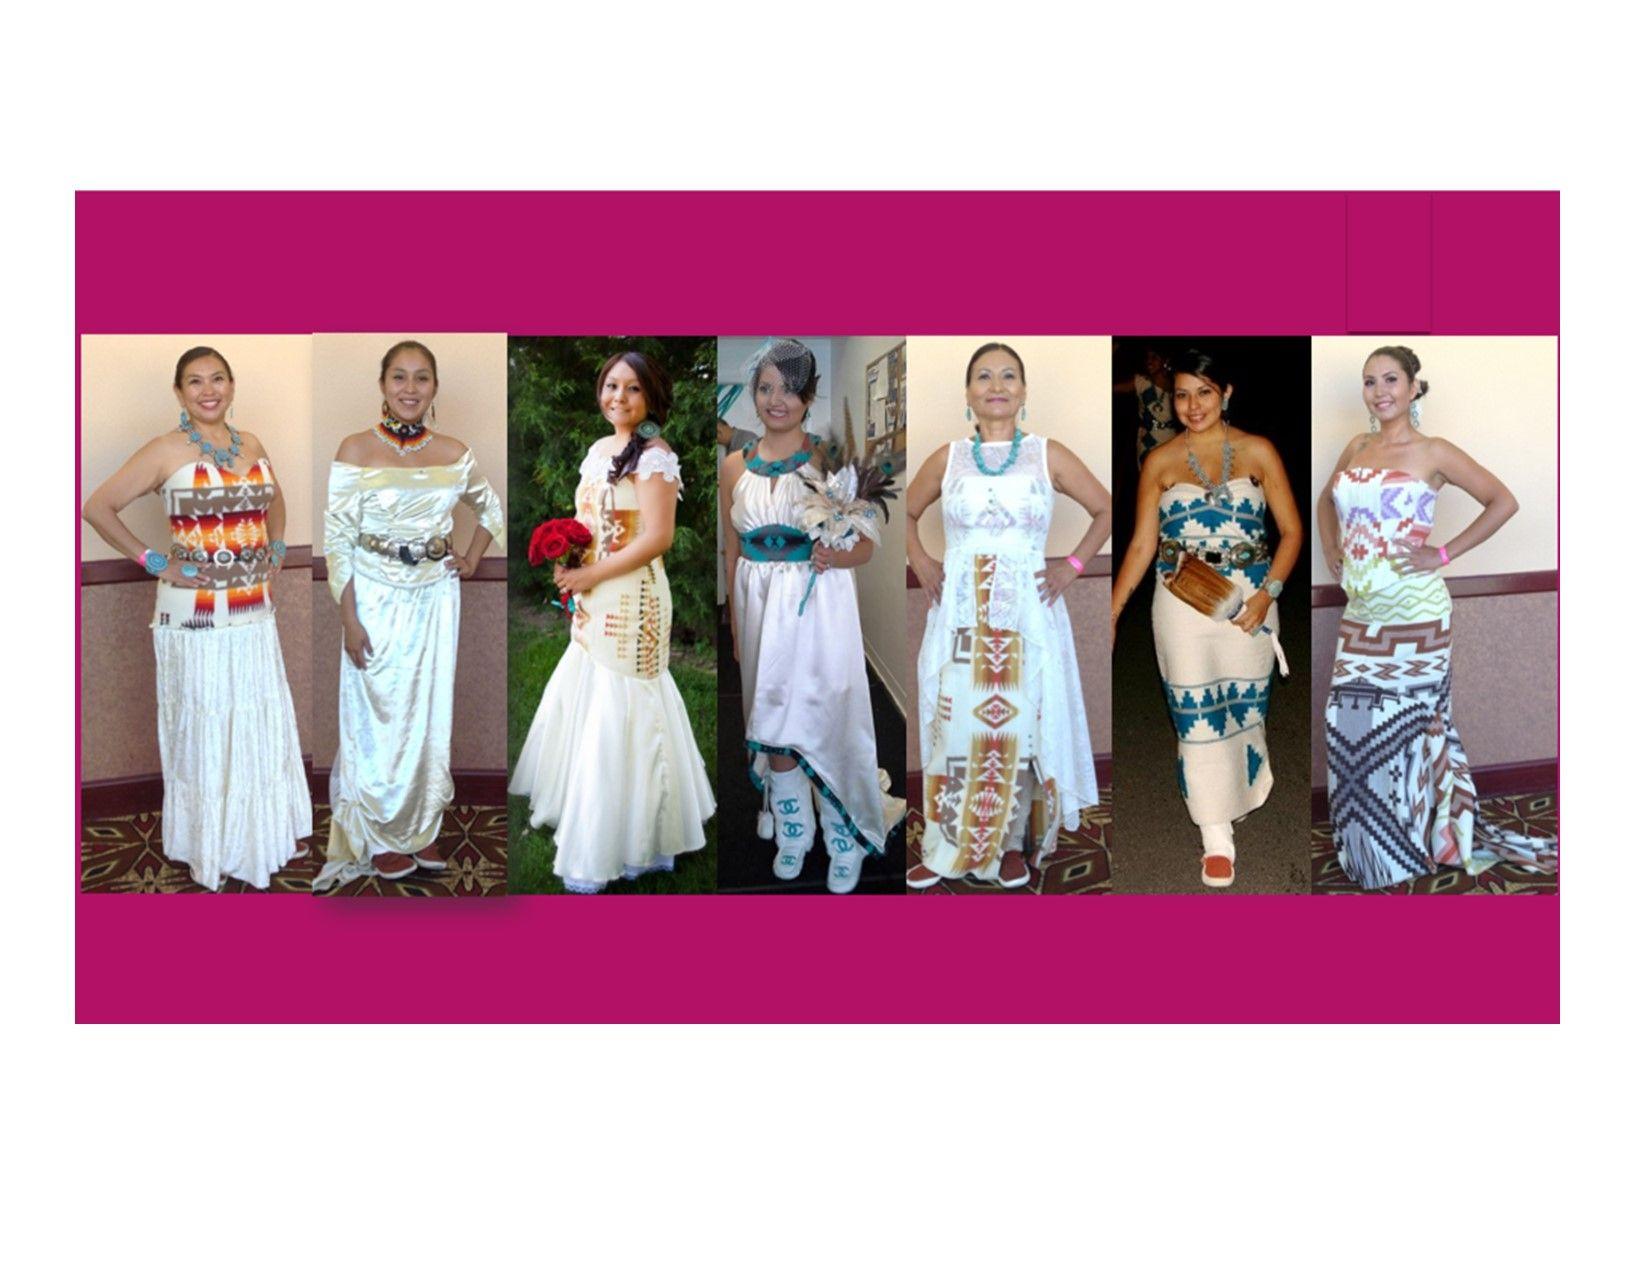 e4fa33b62e8 Native wedding dresses by Irene Begay